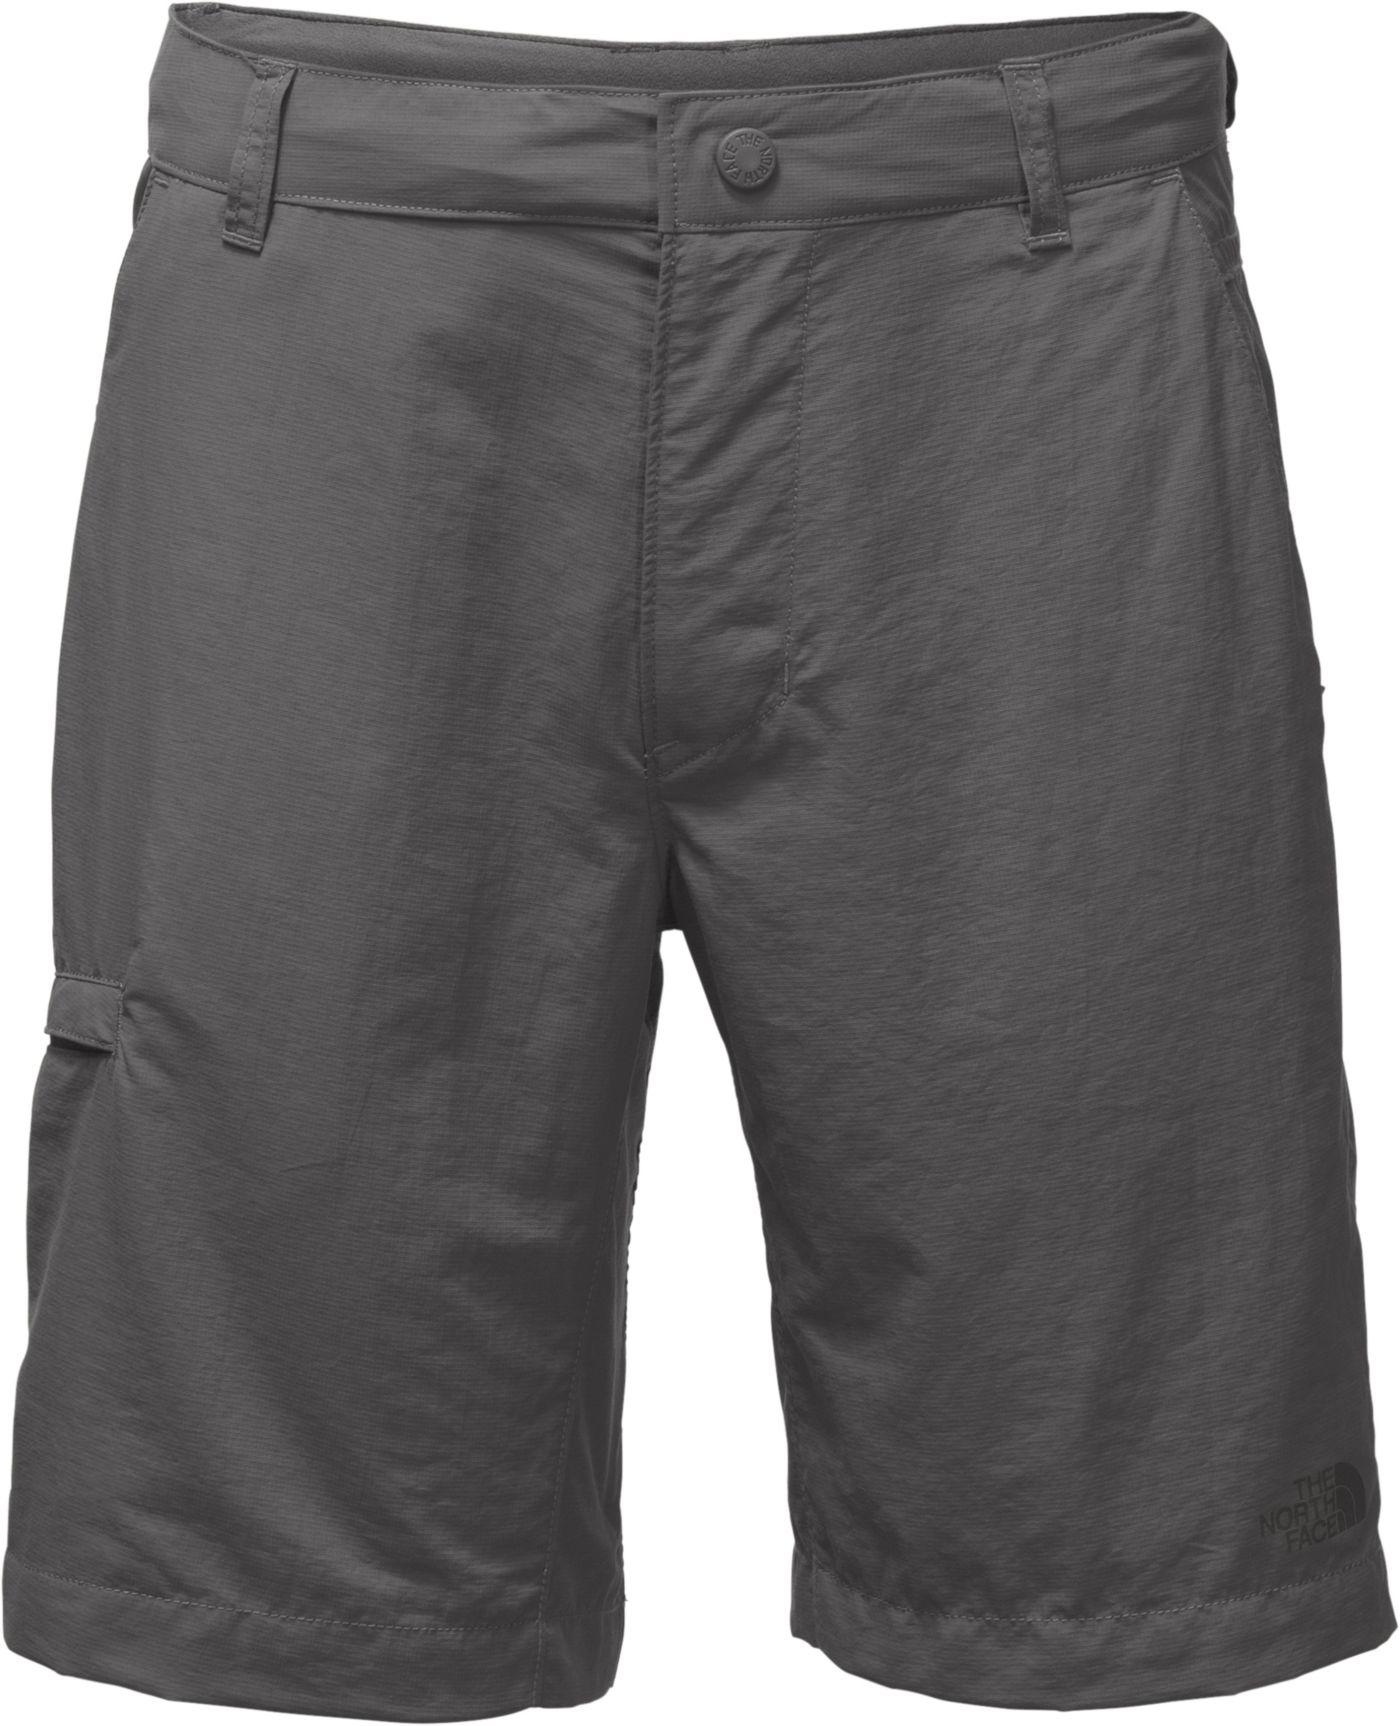 The North Face Men's Horizon 2.0 Hiking Shorts